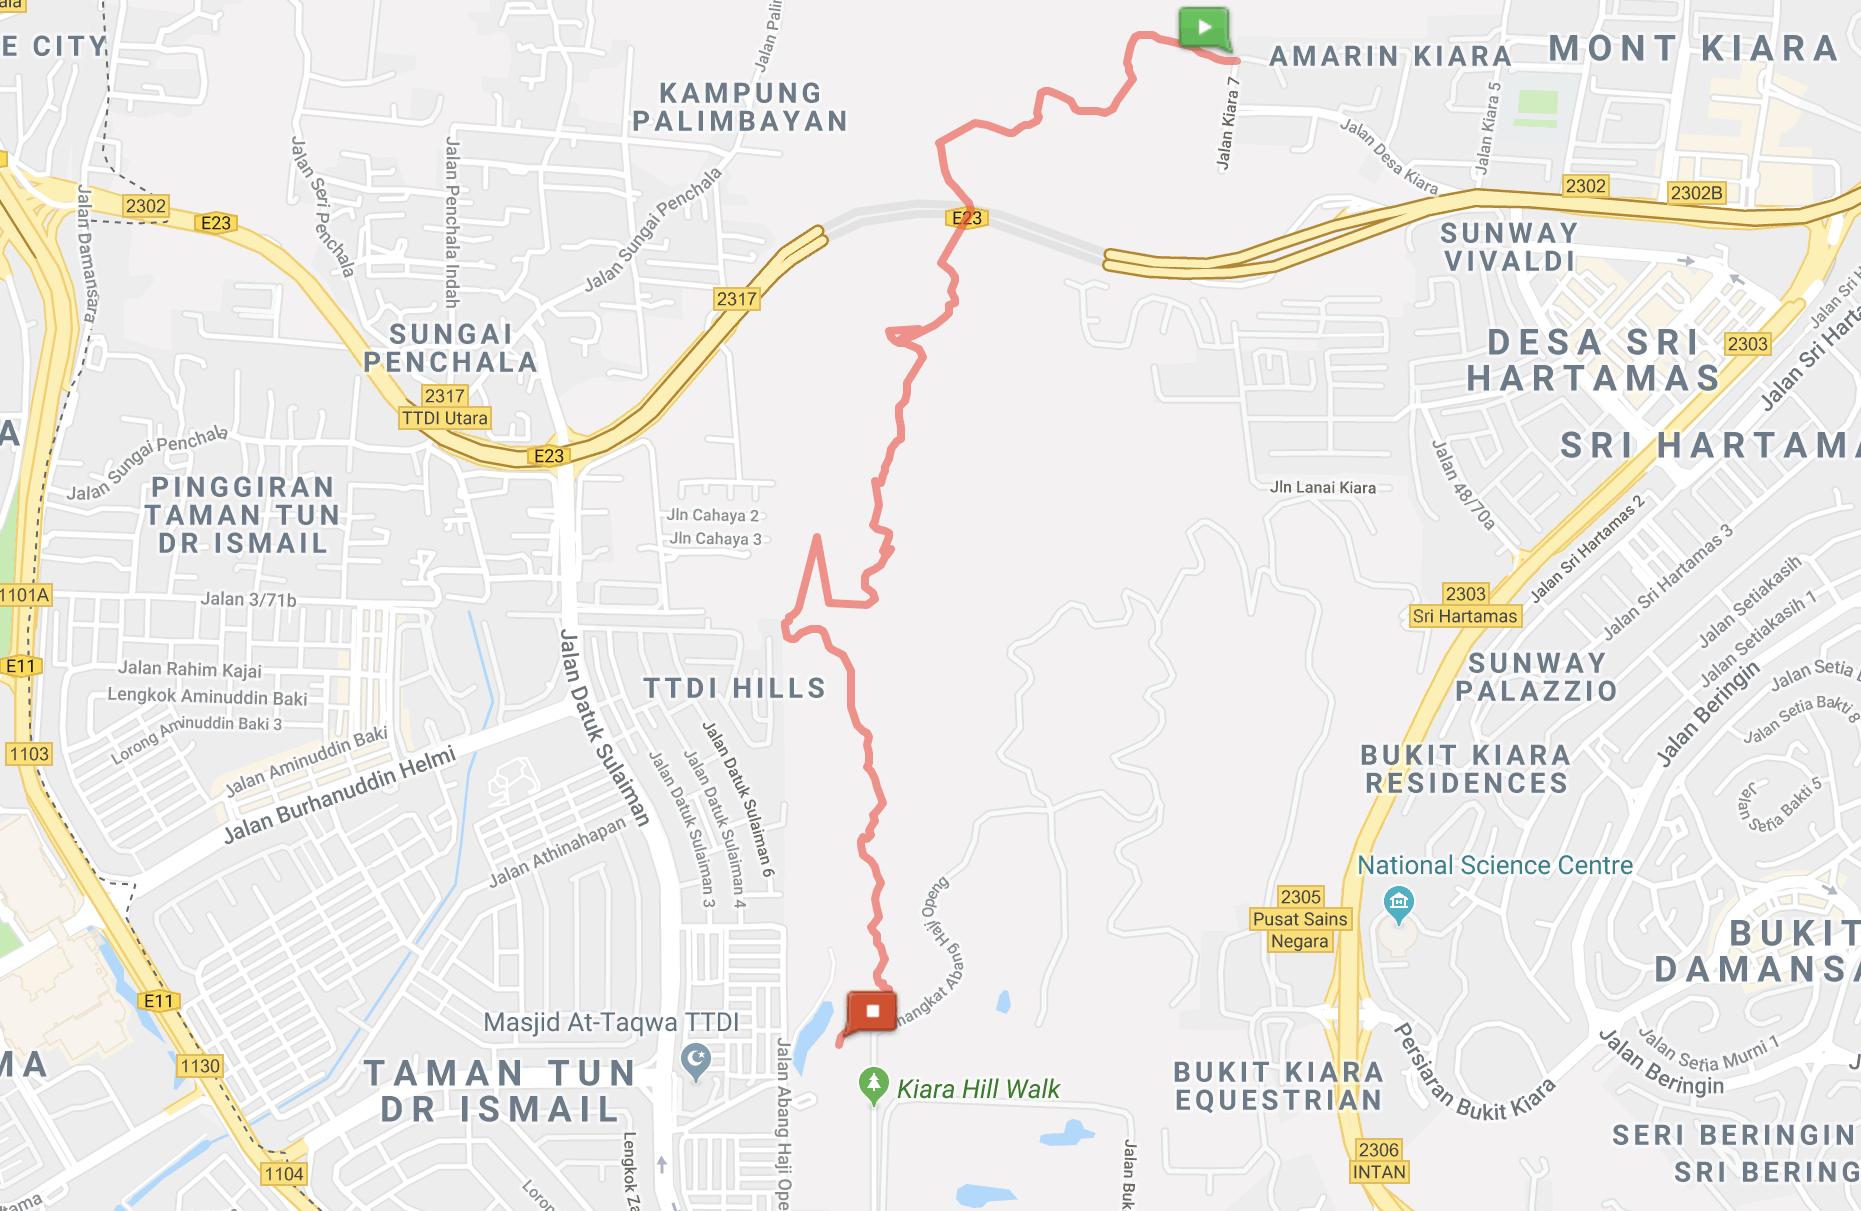 Bukit-Kiara-jungle-hike-Trail-Map-Kuala-Lumpur-1-Malaysia ] Travel Mermaid